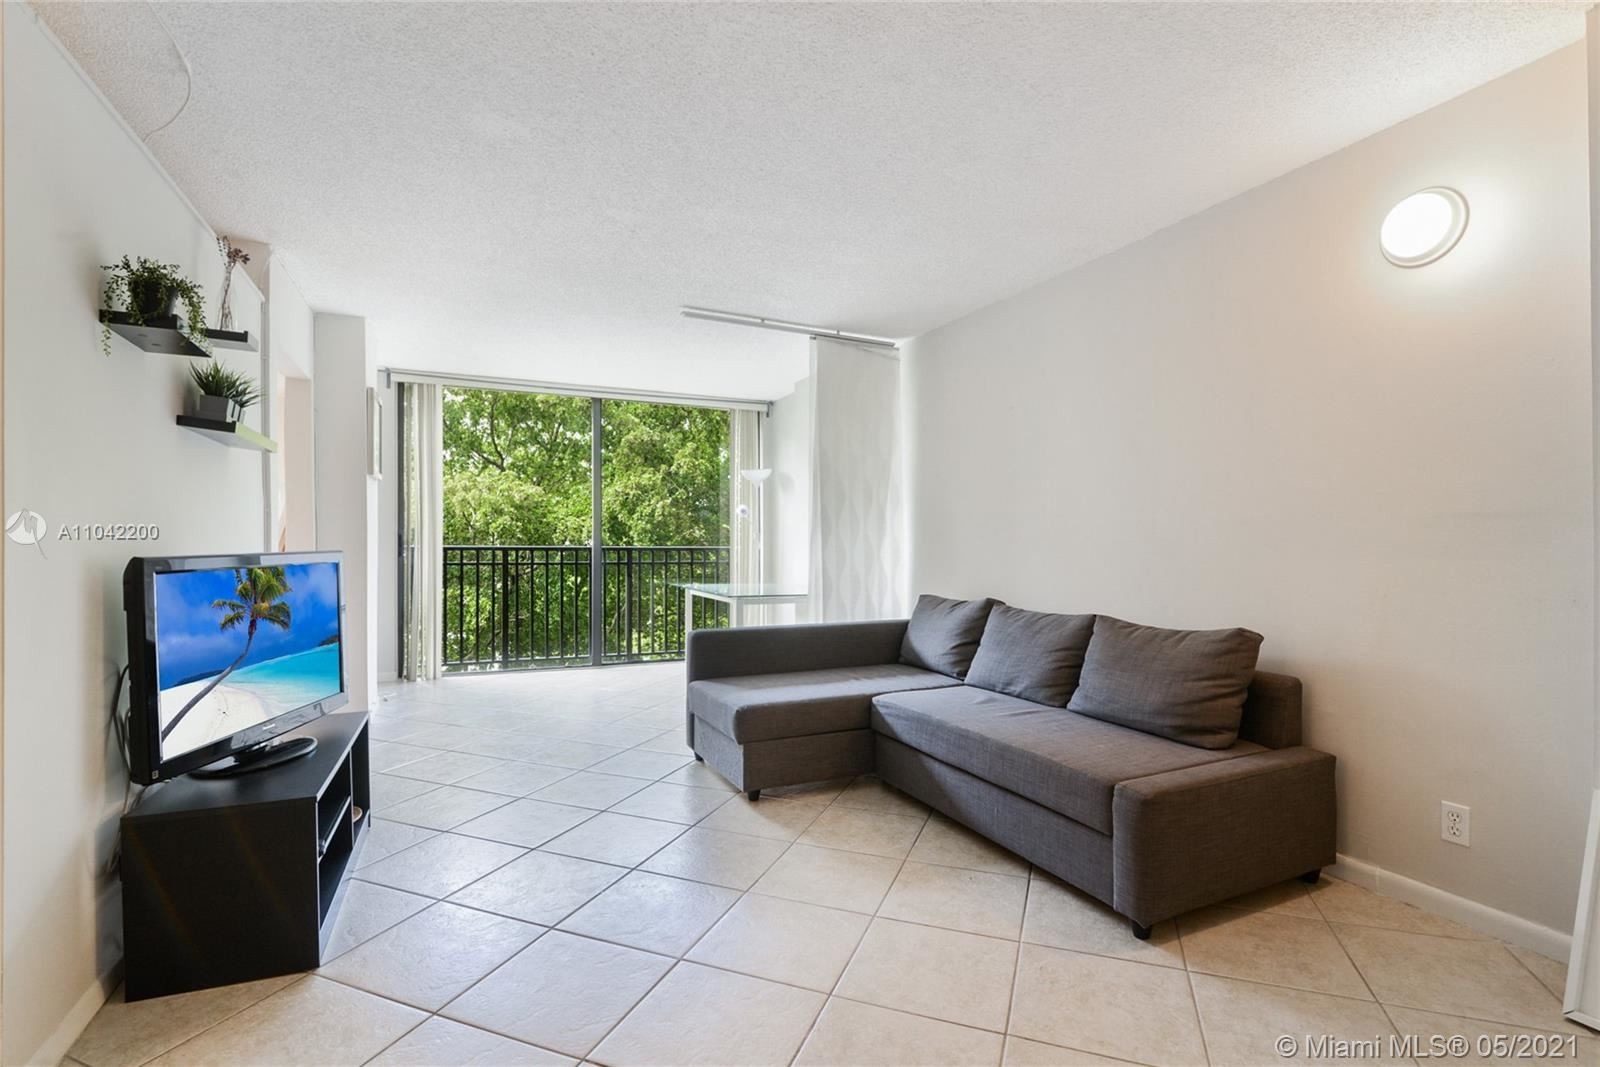 Photo of 16919 N Bay Rd #414, Sunny Isles Beach, FL 33160 (MLS # A11042200)